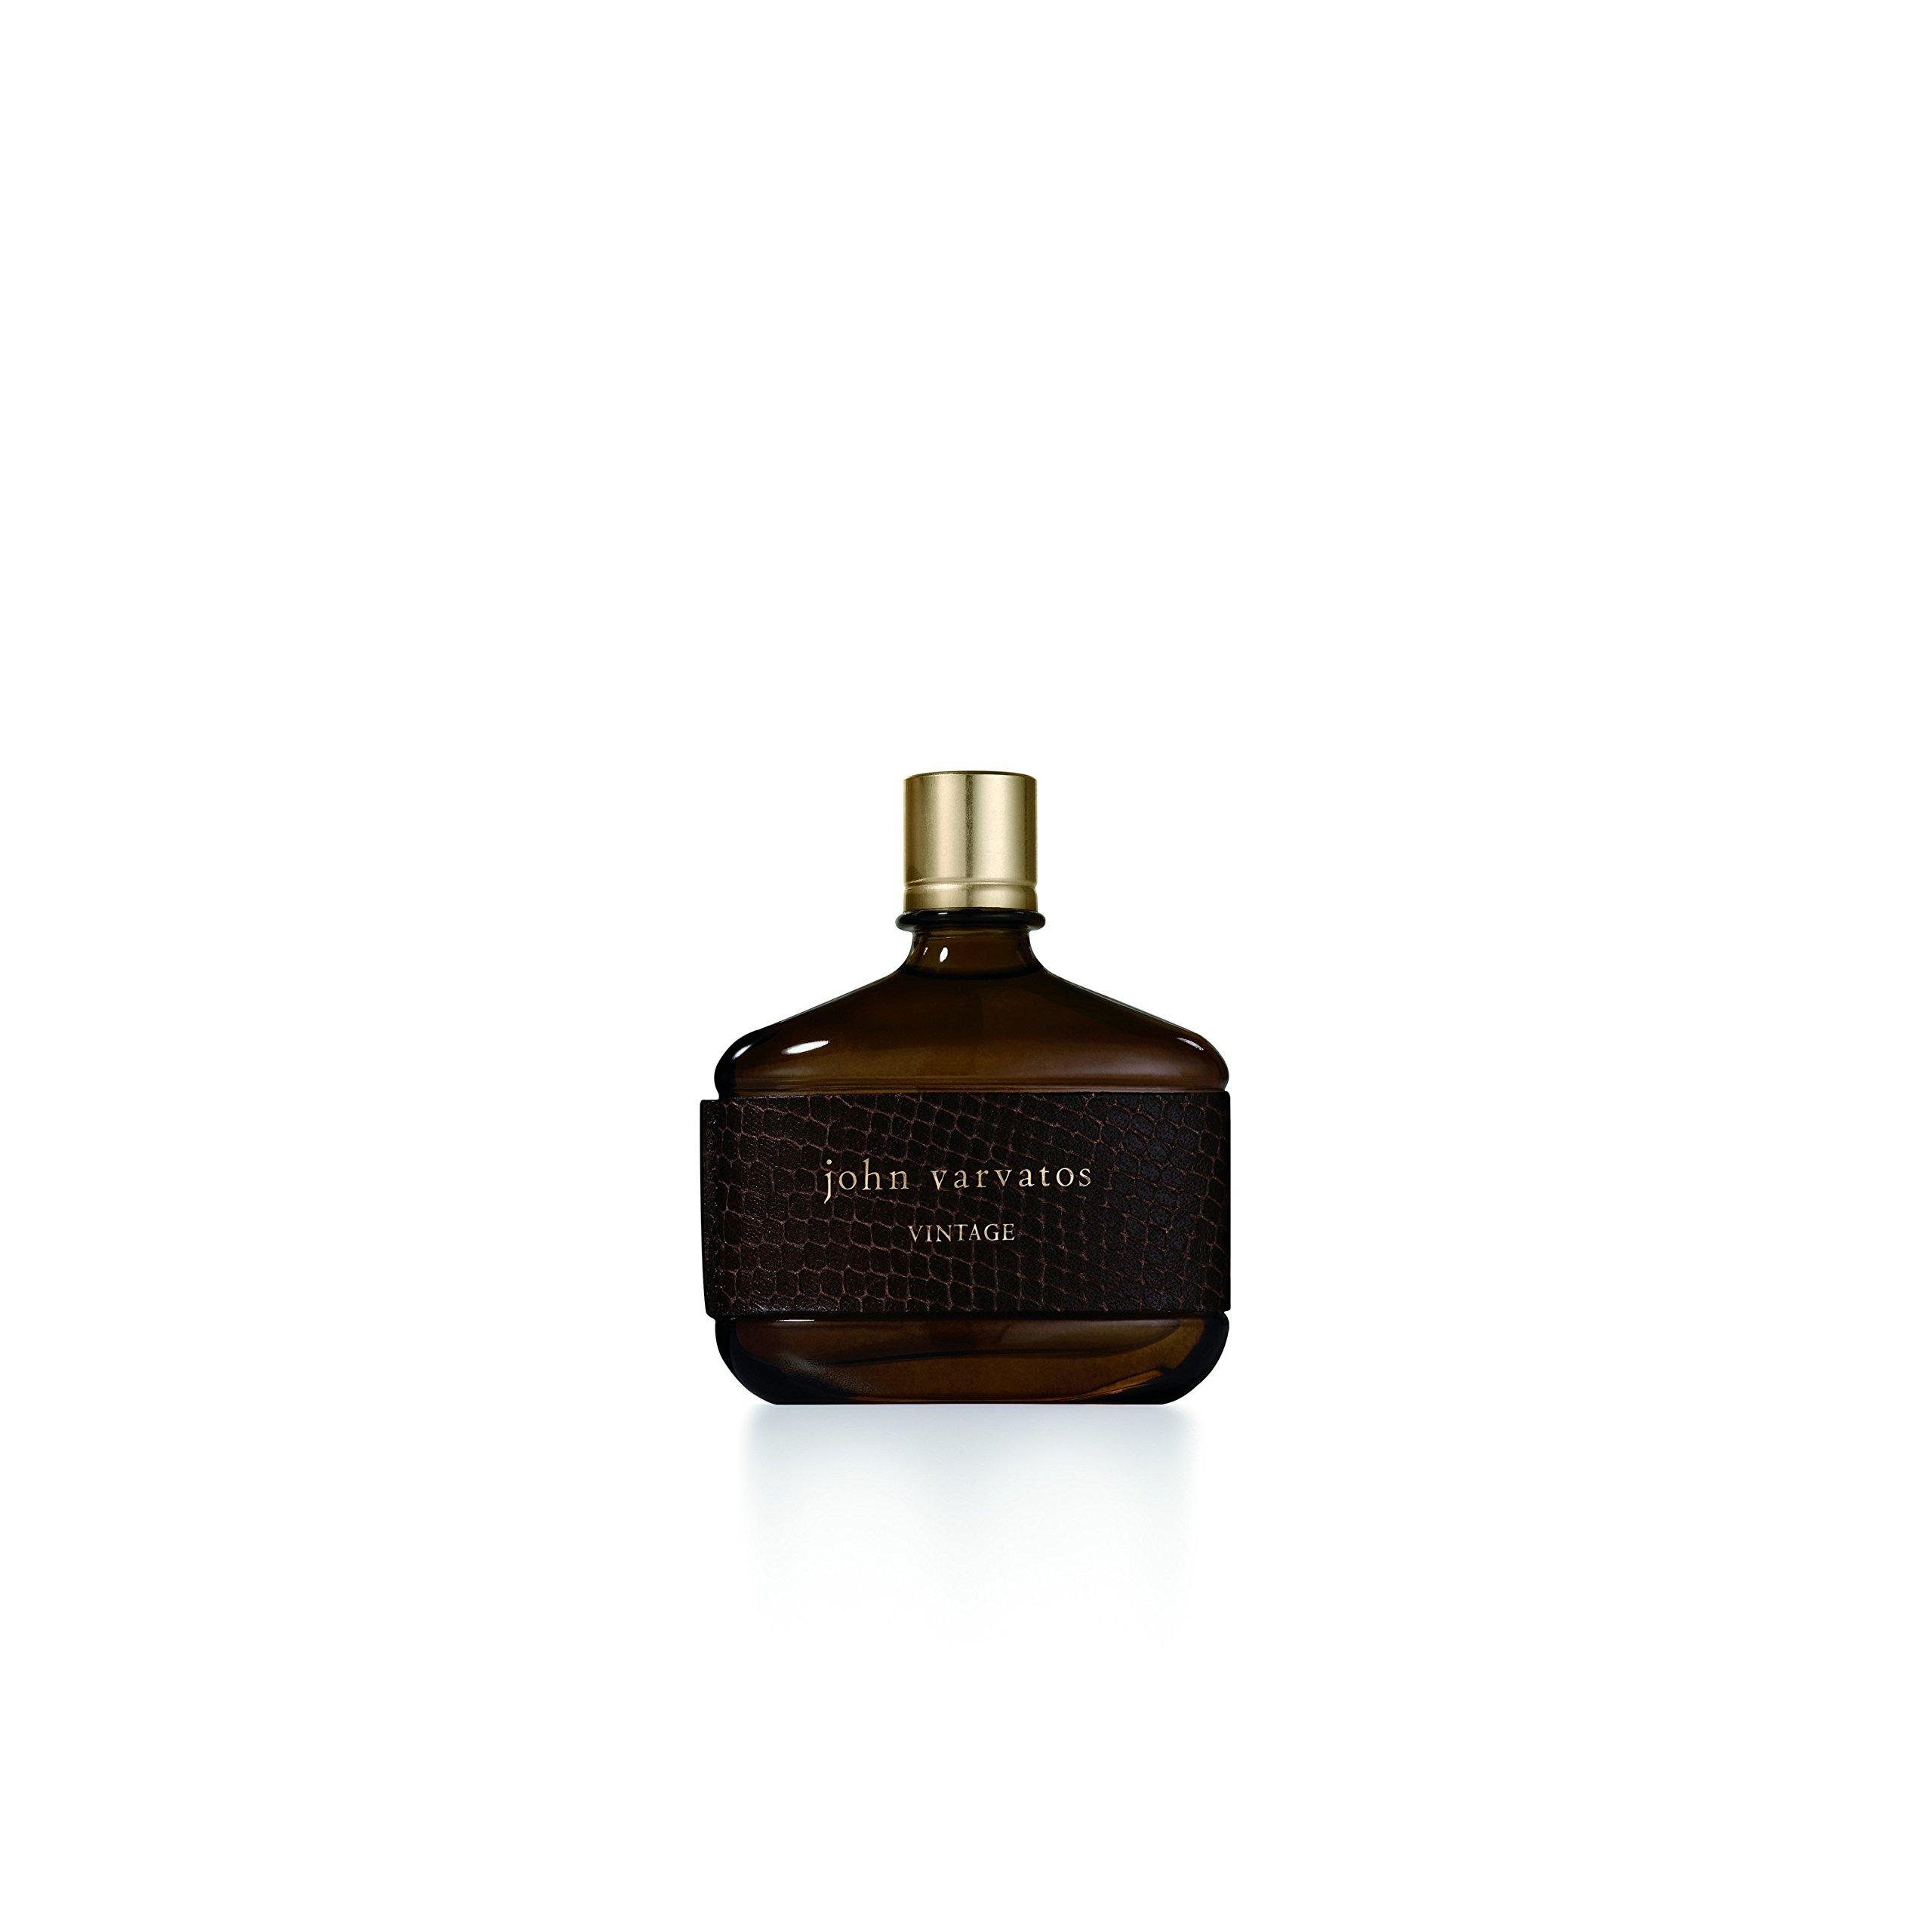 Amazon.com: John Varvatos Vintage Eau de Toilette Spray, 4.2 oz.: JOHN VARVATOS: Luxury Beauty